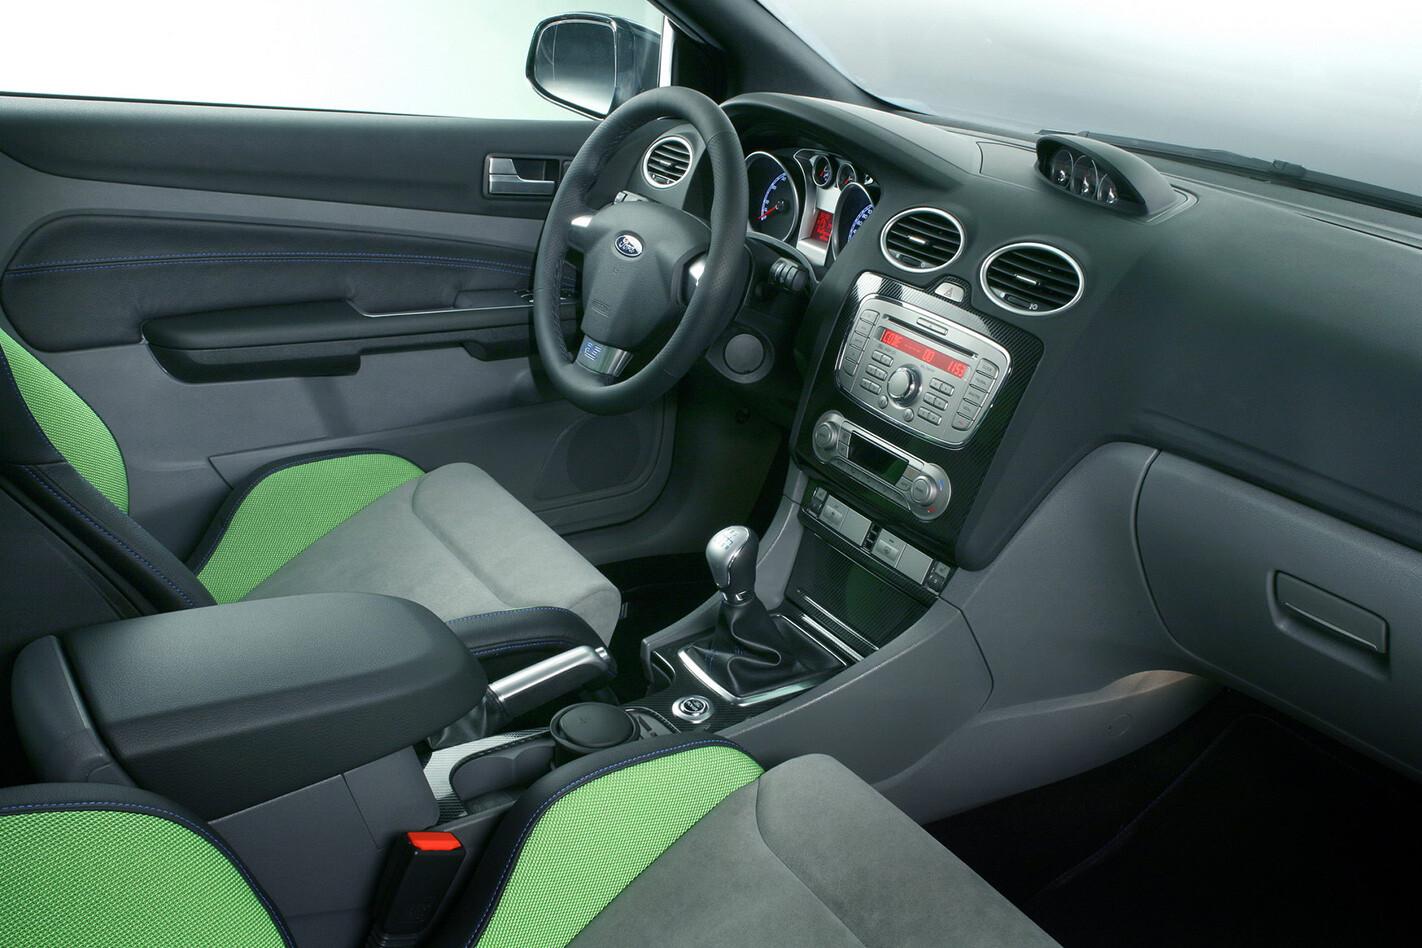 2008 Ford Focus RS interior